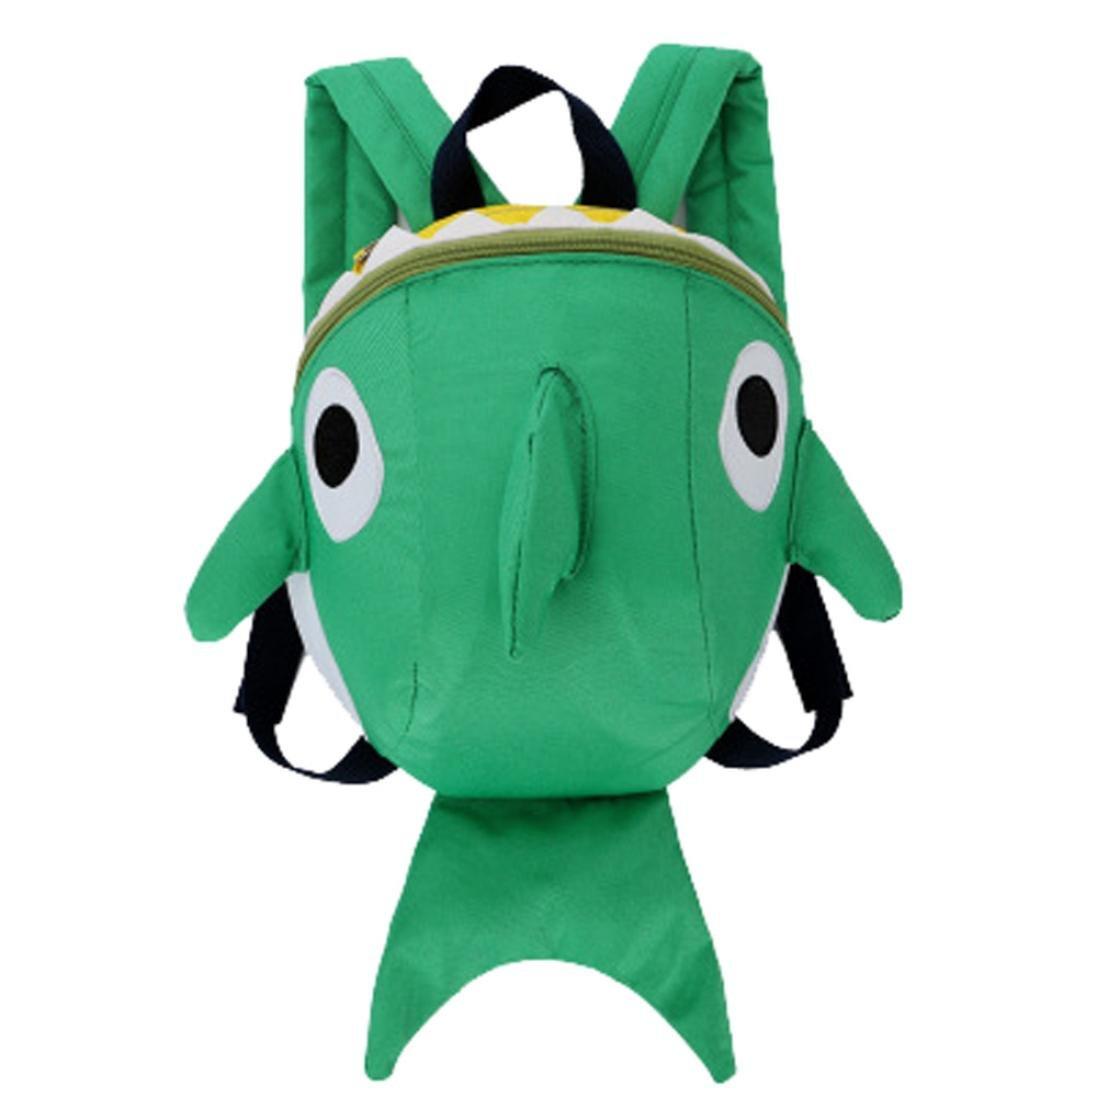 fimkaul子供ベビー女の子男の子Kids Cartoon Animalバックパック幼児用スクールバッグキッズ3年  グリーン B07F8ZWPLJ